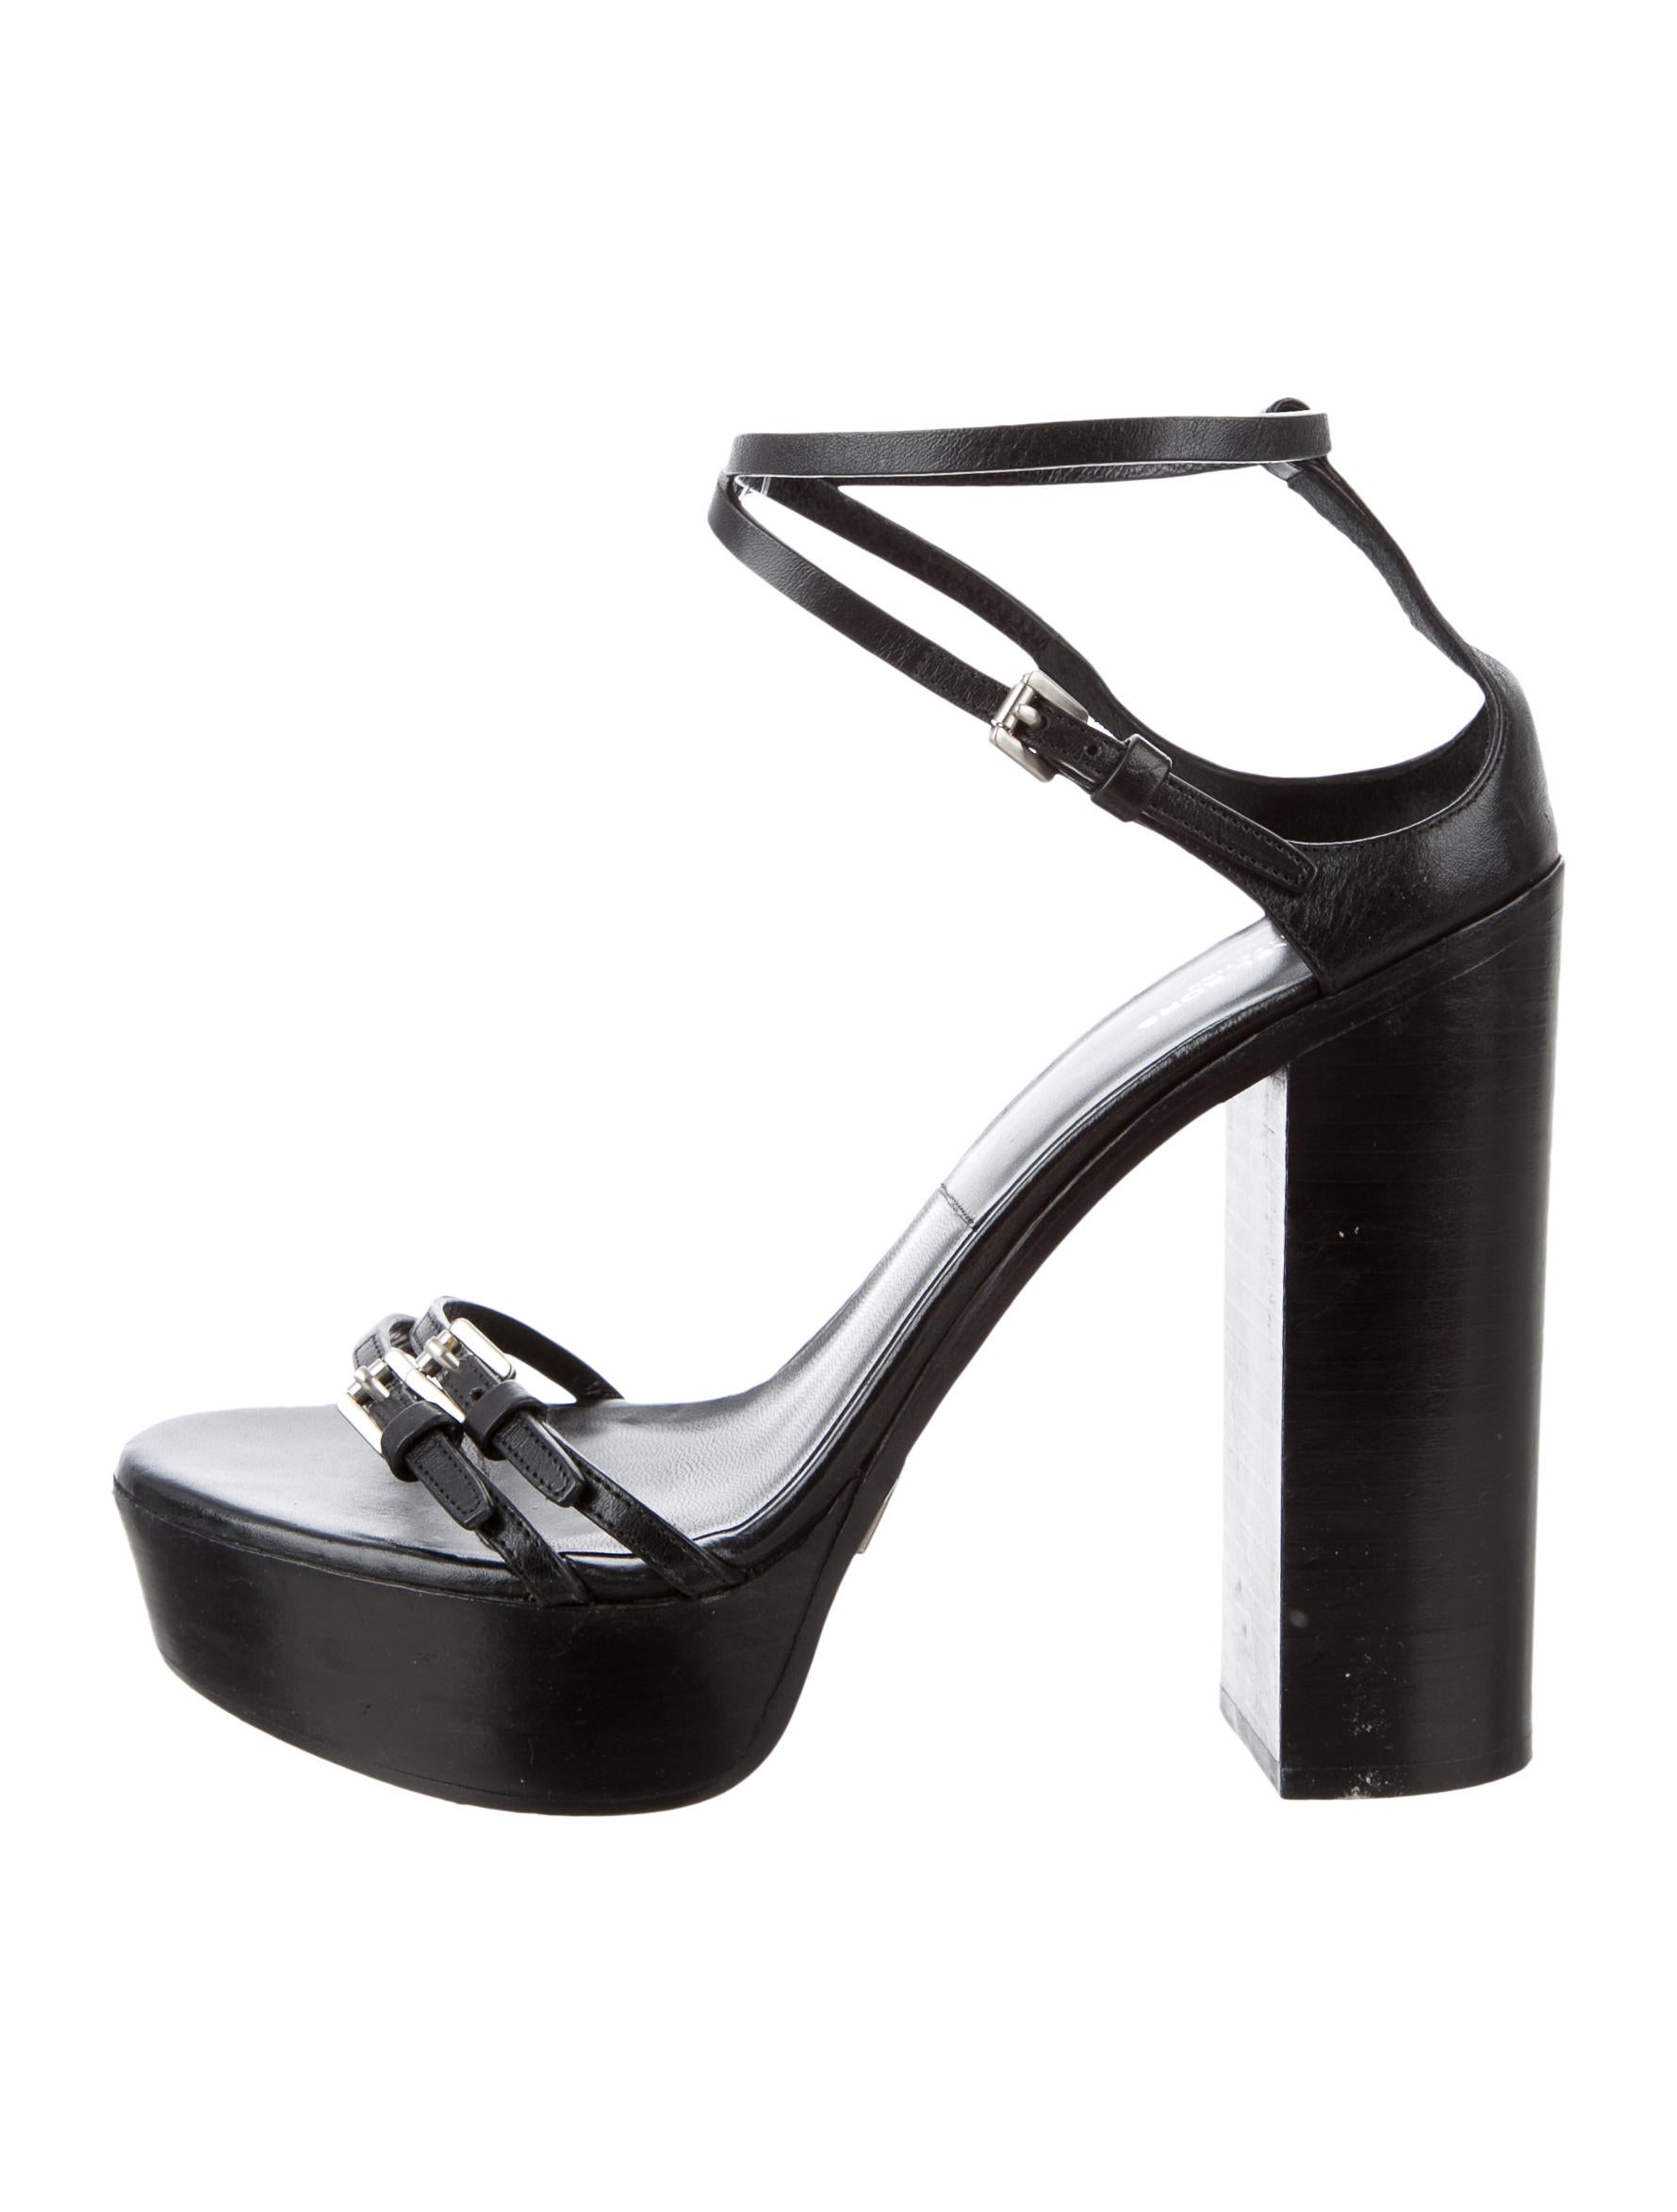 michael kors leather platform sandals shoes mic48705